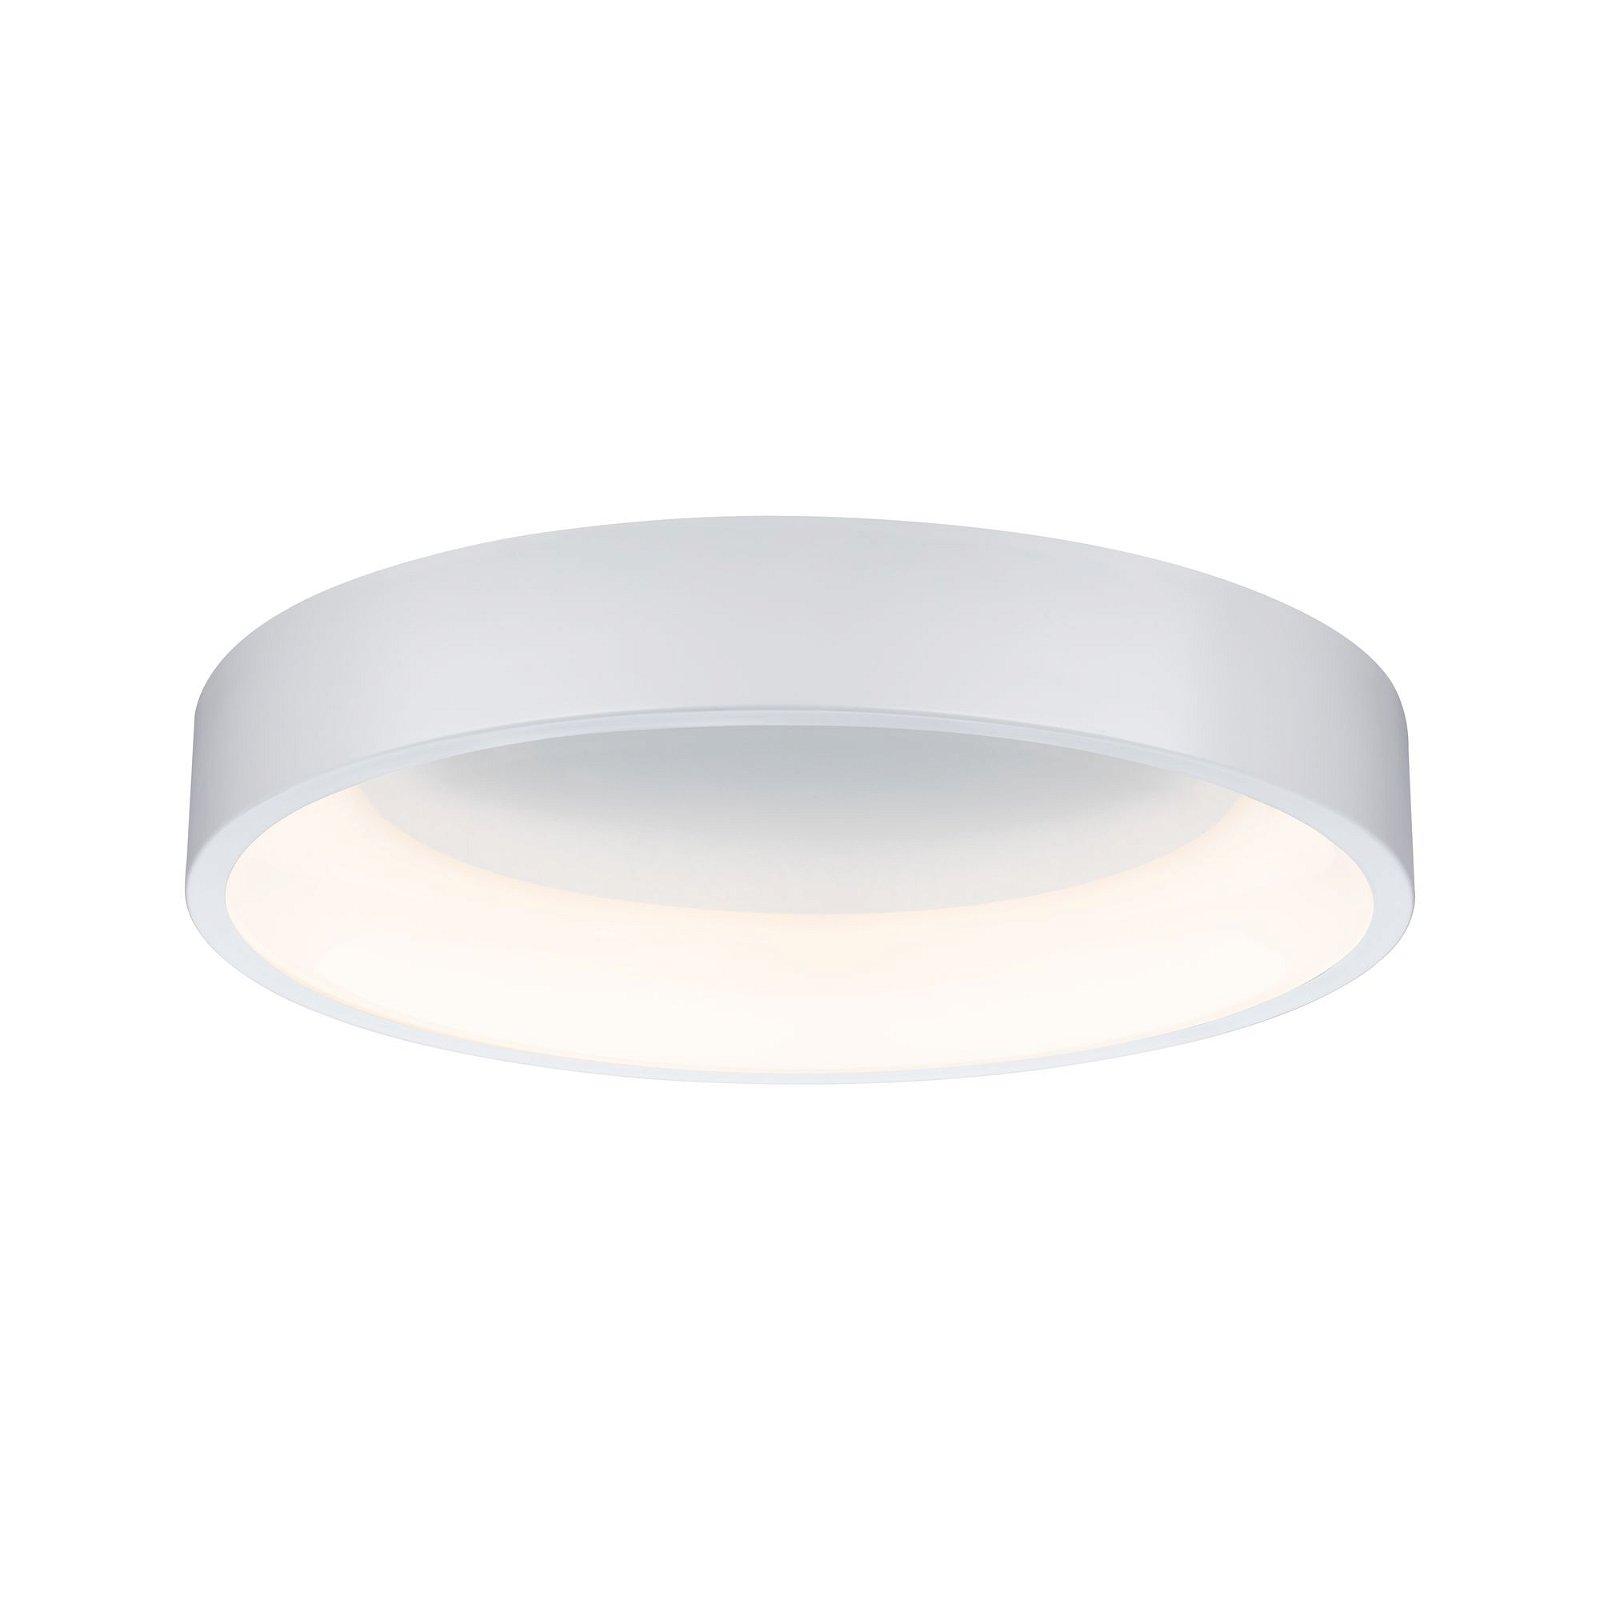 LED-plafondlamp Ardora 2700K 3074lm 230V 31W Wit